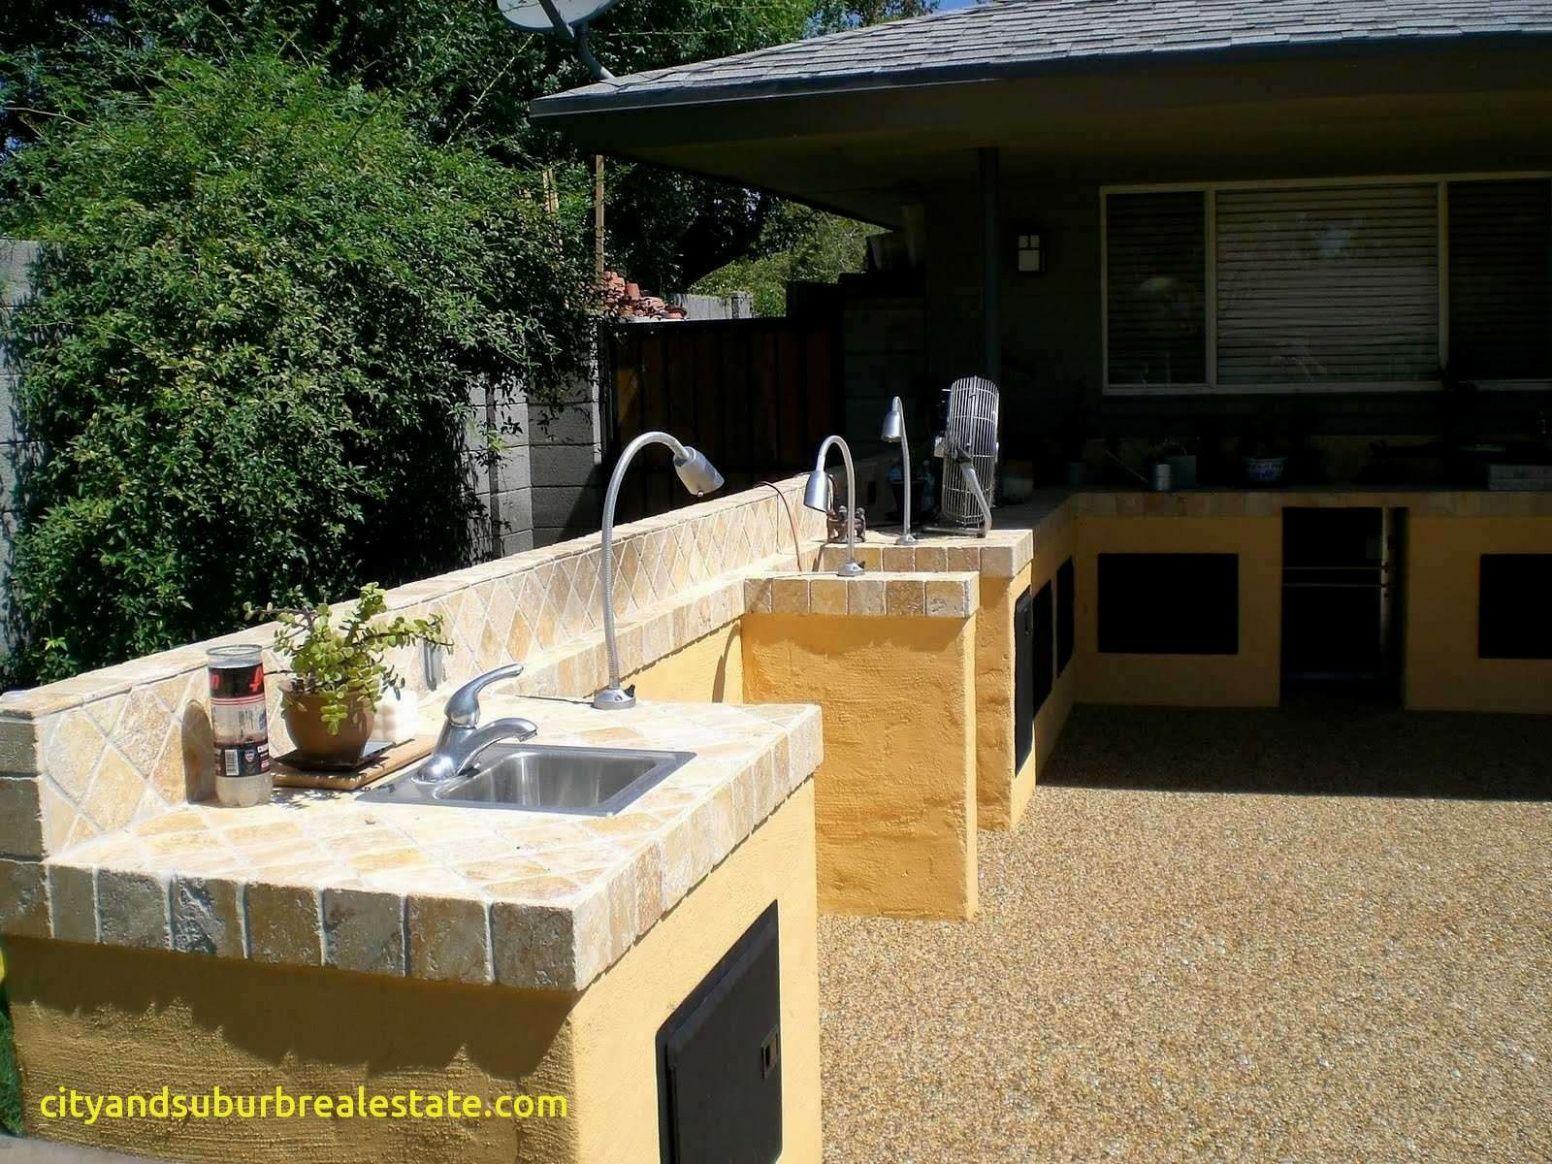 Lovely Waterproof Outdoor Kitchen Cabinets Dapur Luar Ruangan Interior Modern